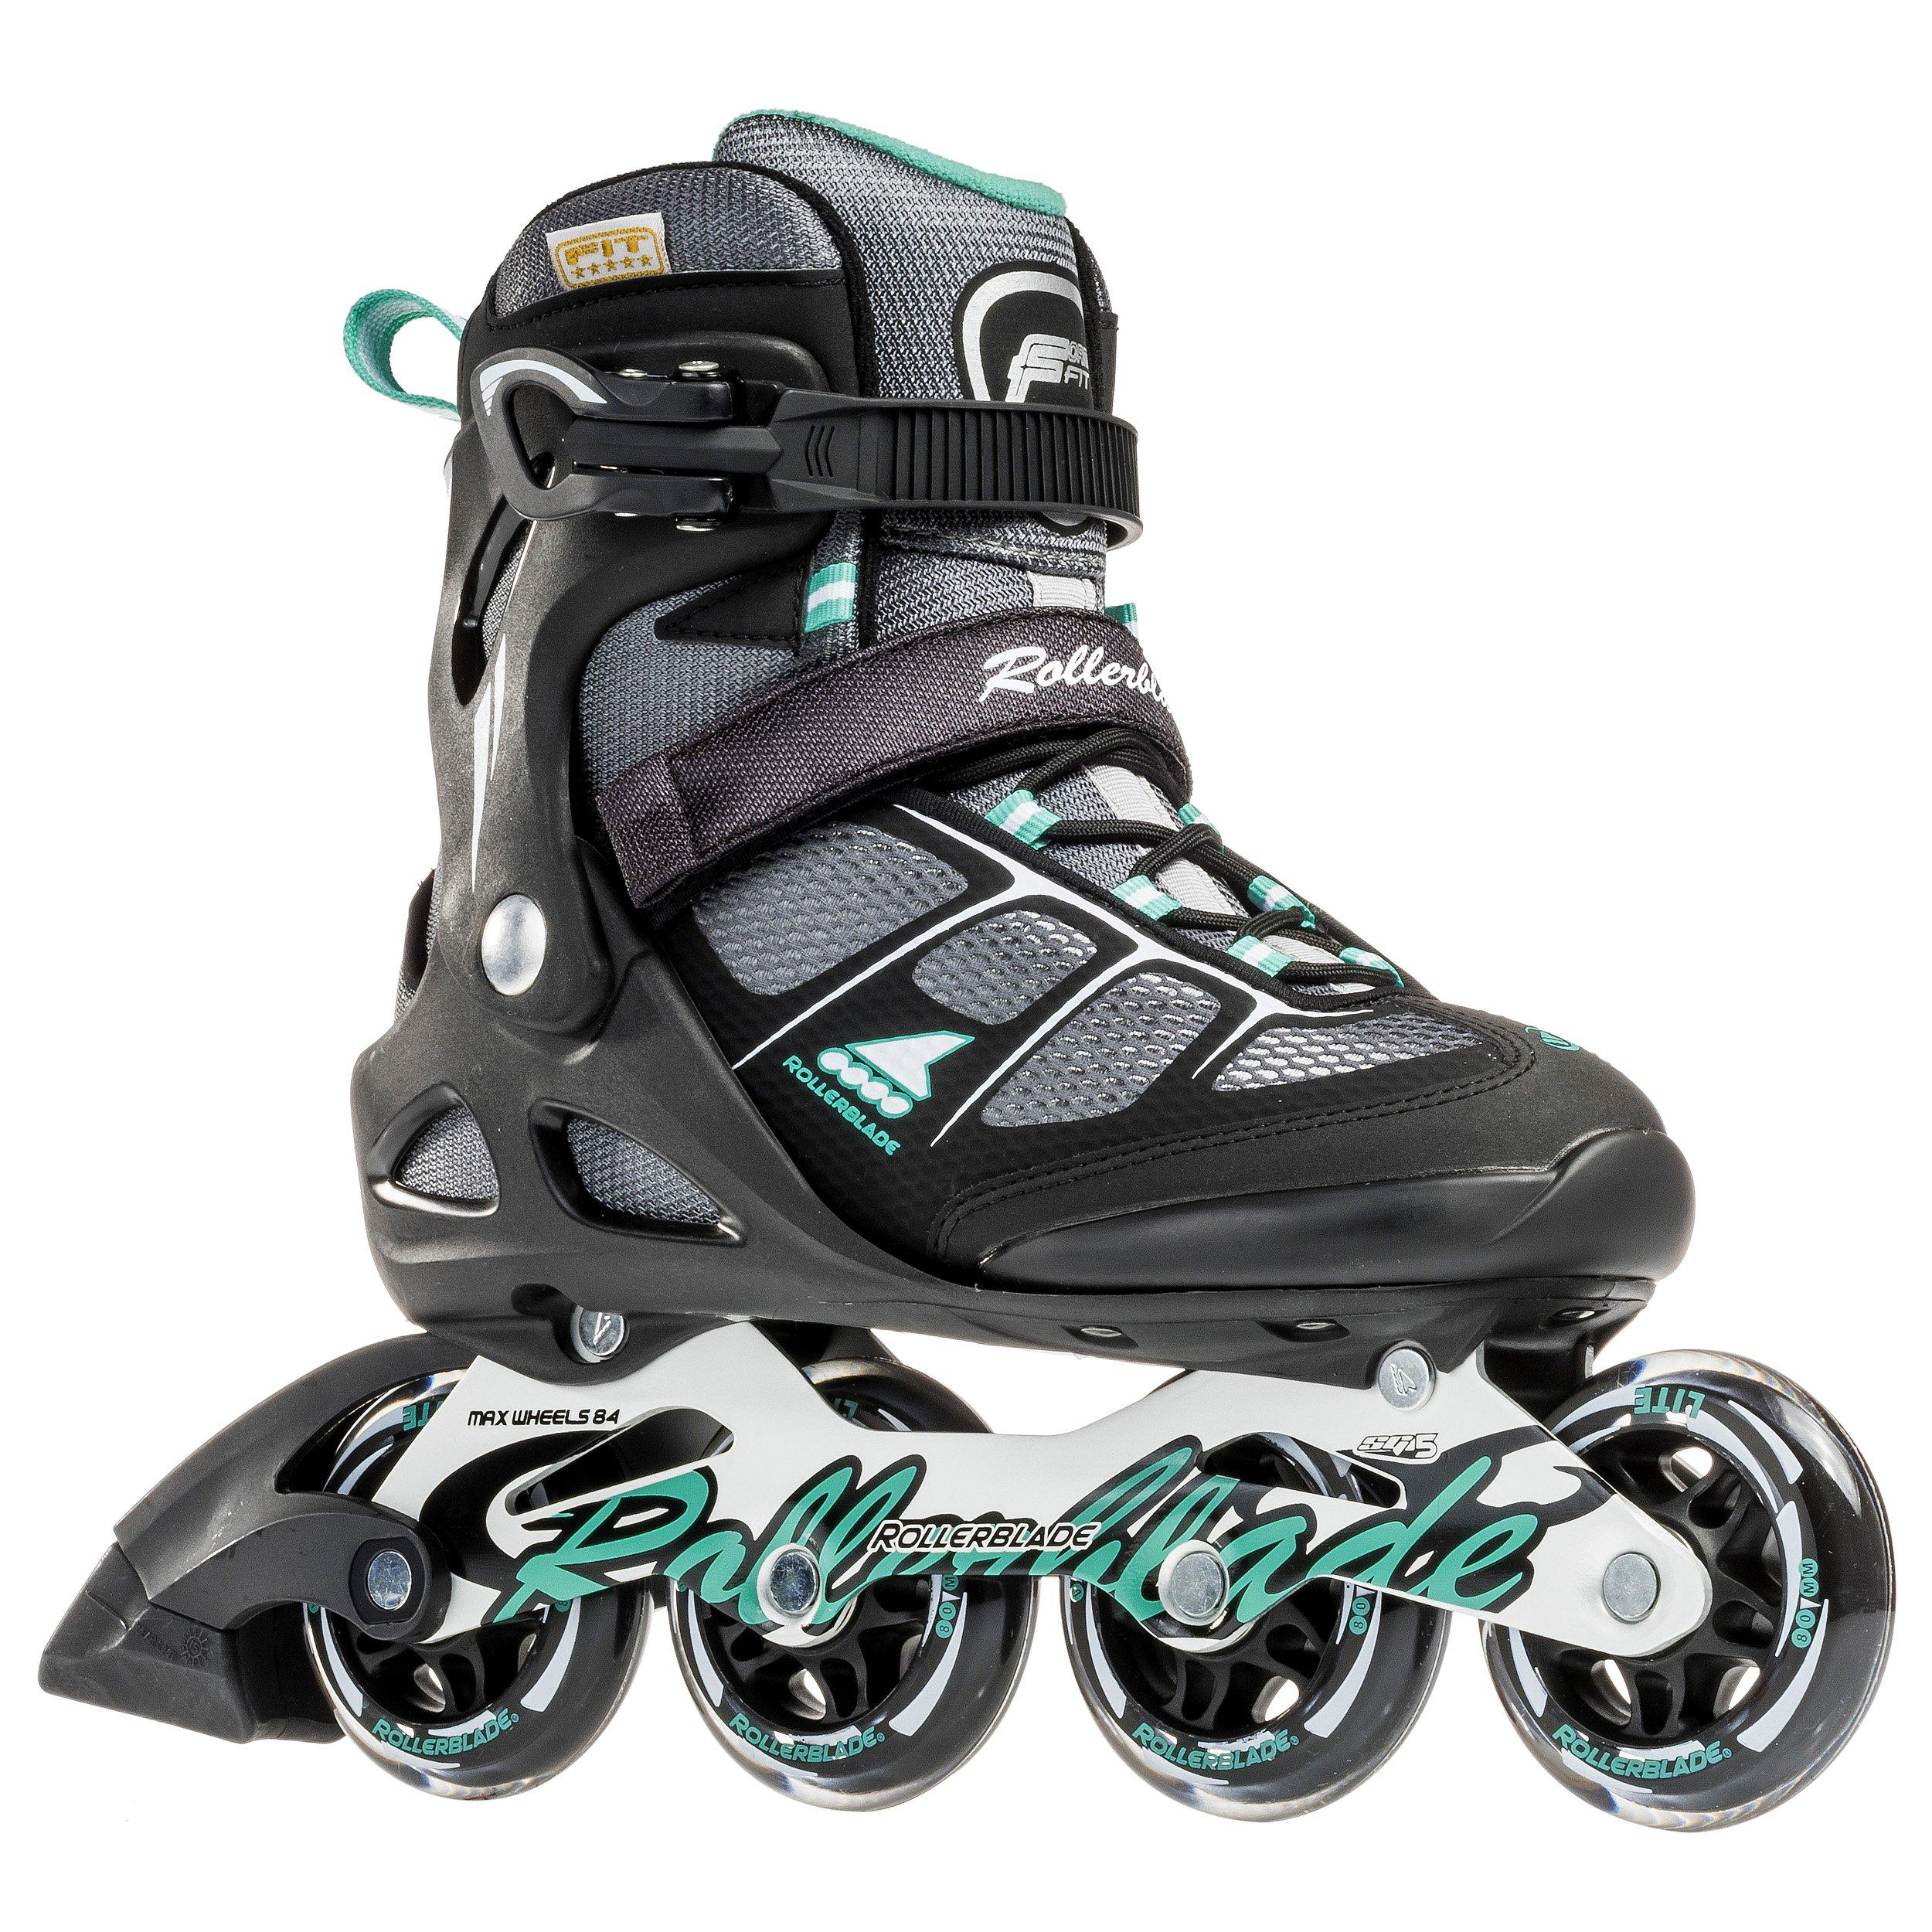 Rollerblade Macroblade 80 Alu 16 All Purpose Skate, Black/Light Green, US Size 6